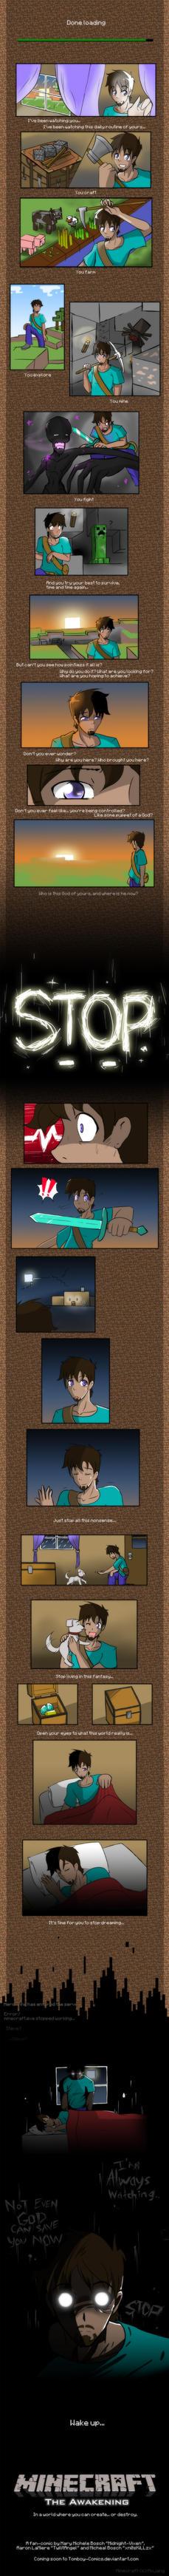 Minecraft Comic Teaser by MidNight-Vixen